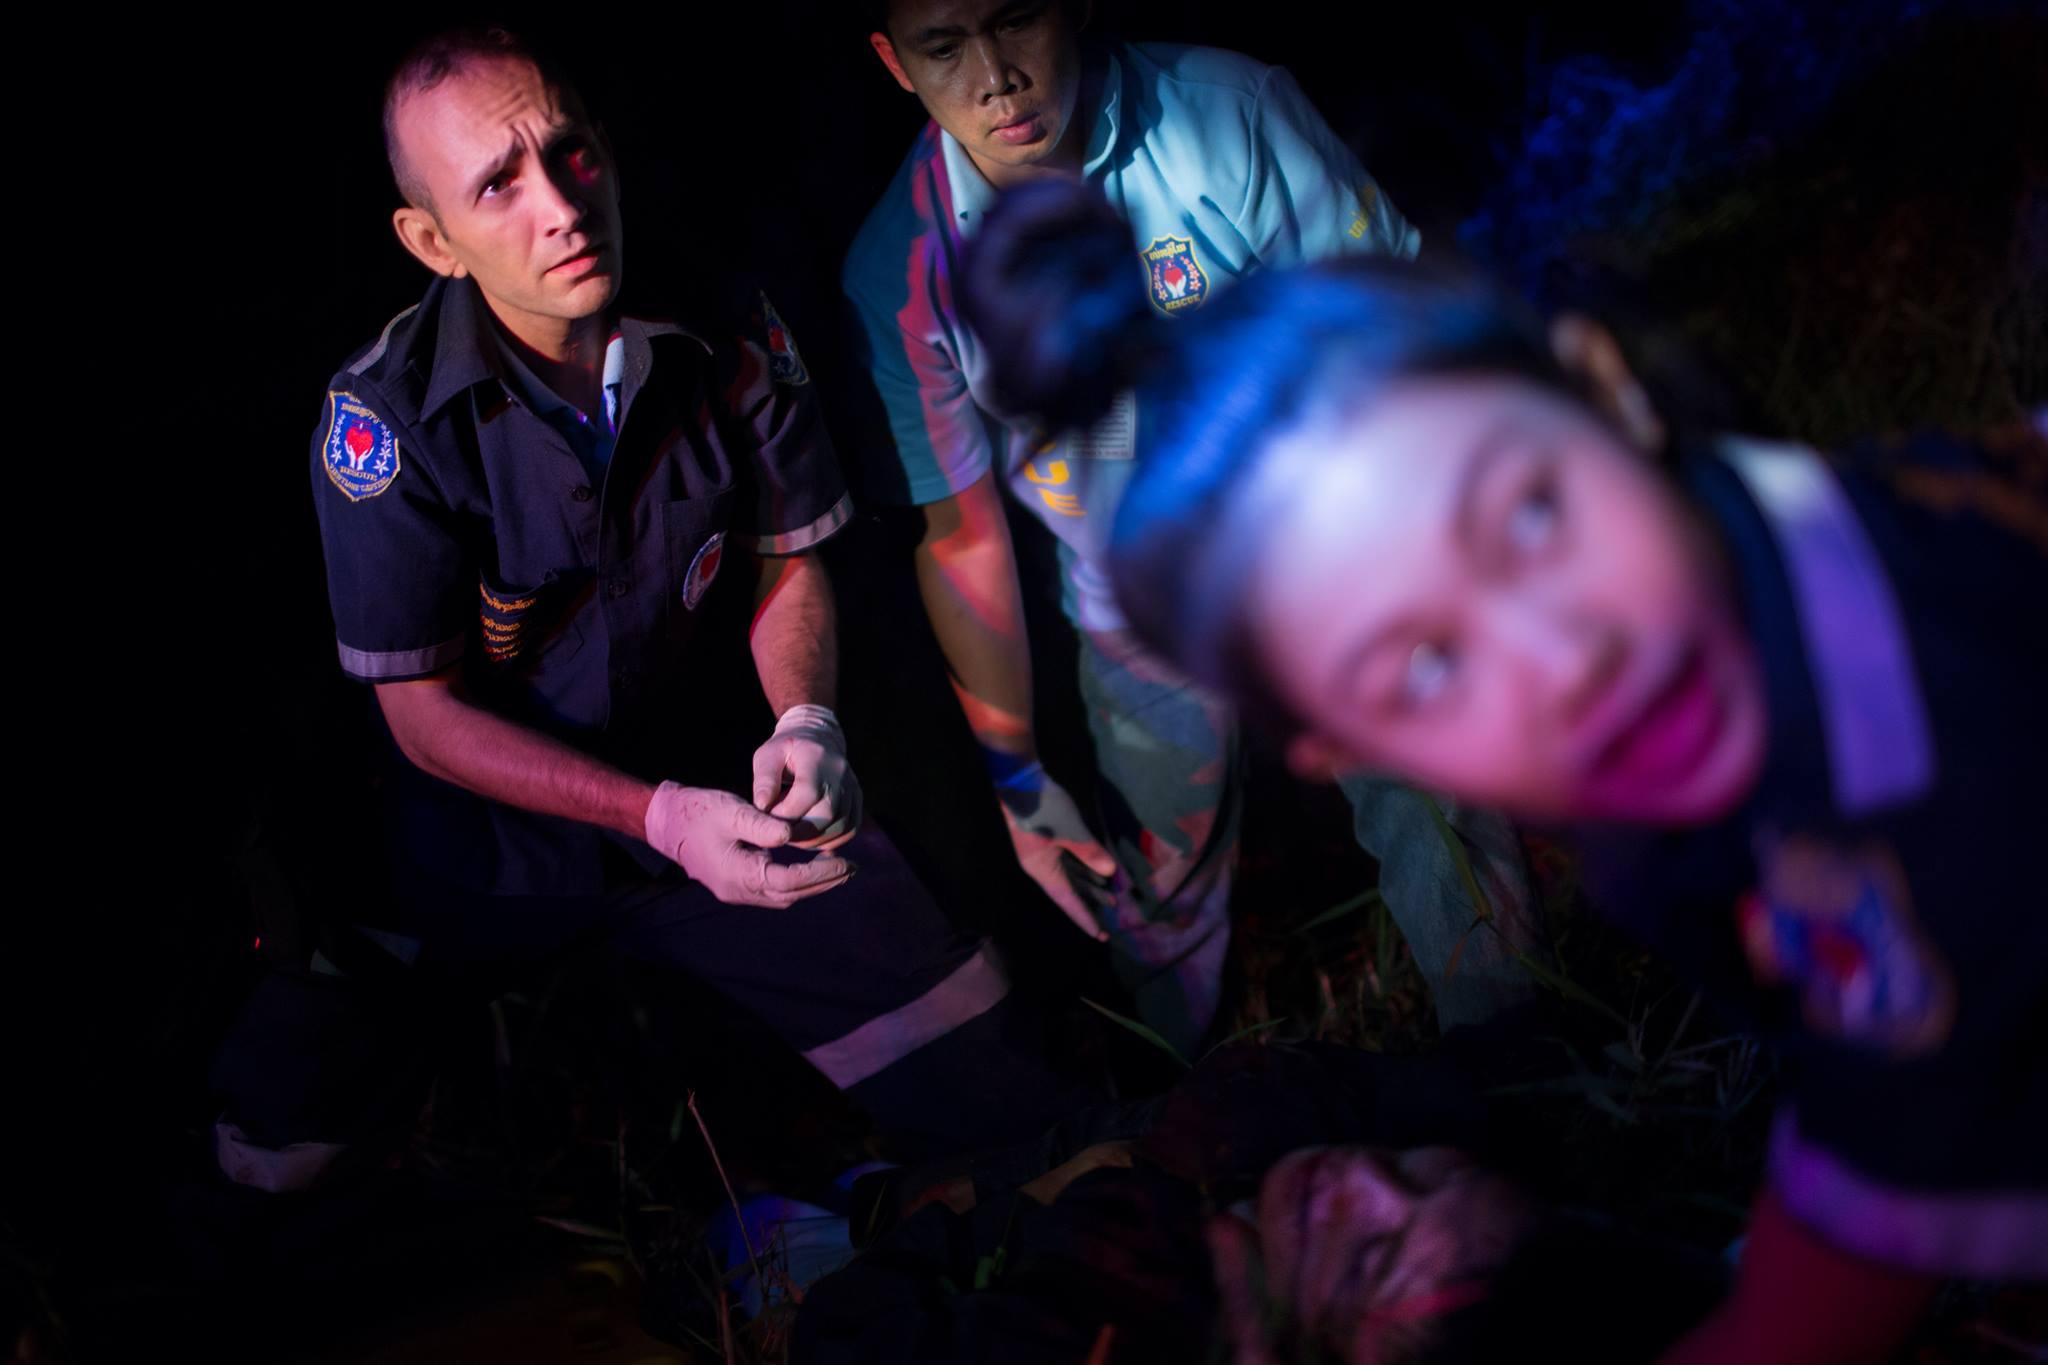 Photo Credit: Laura Constantin, Adryel Talamantes & Vientiane Rescue